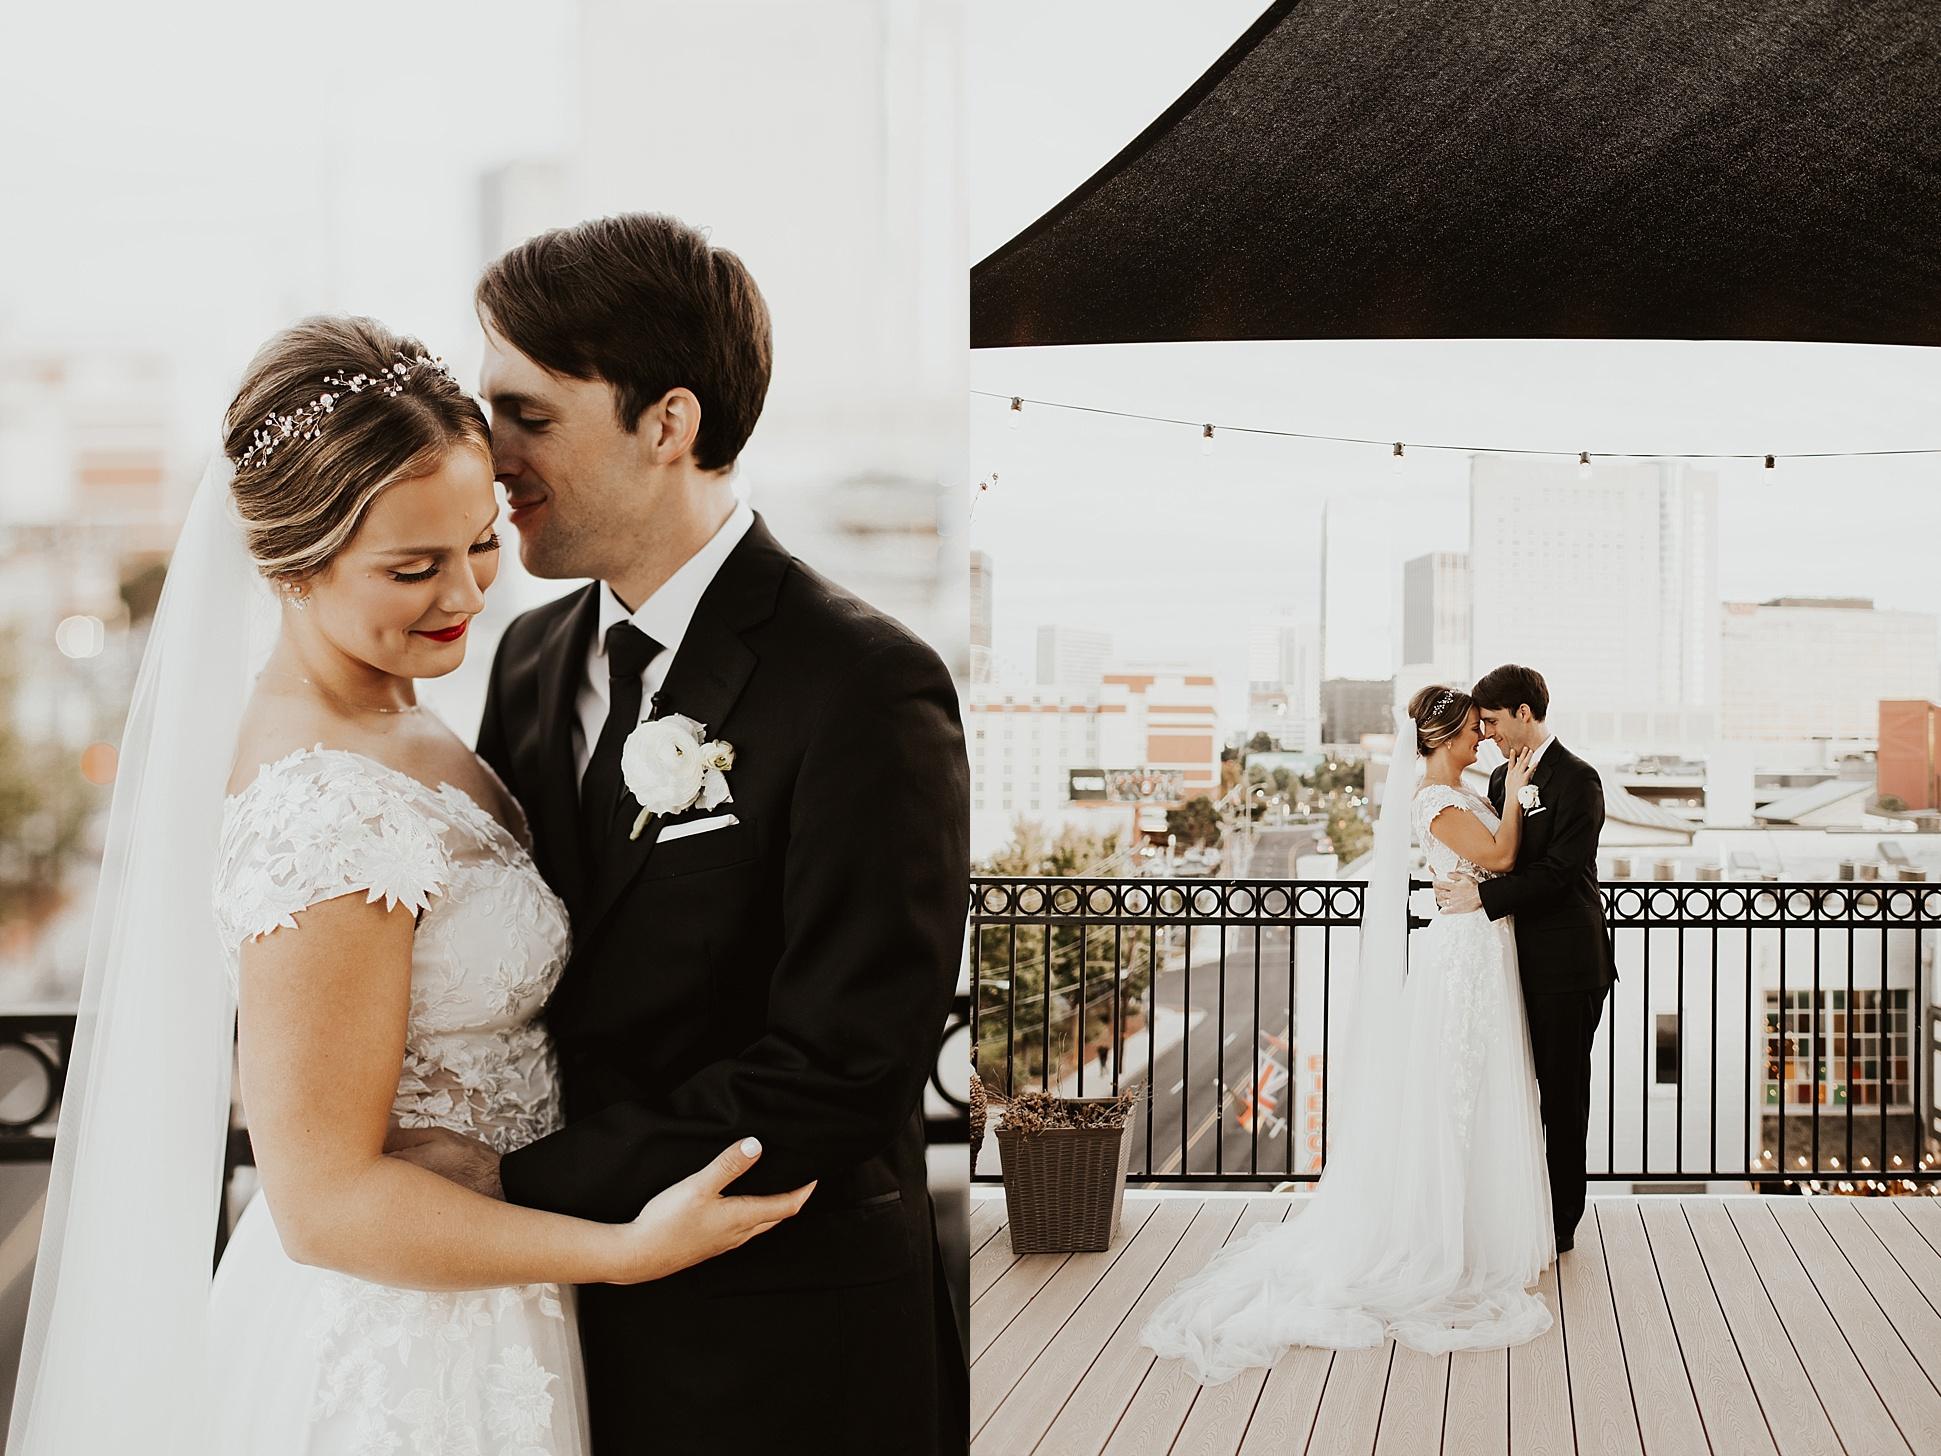 terminus_330_wedding_atlanta062.JPG